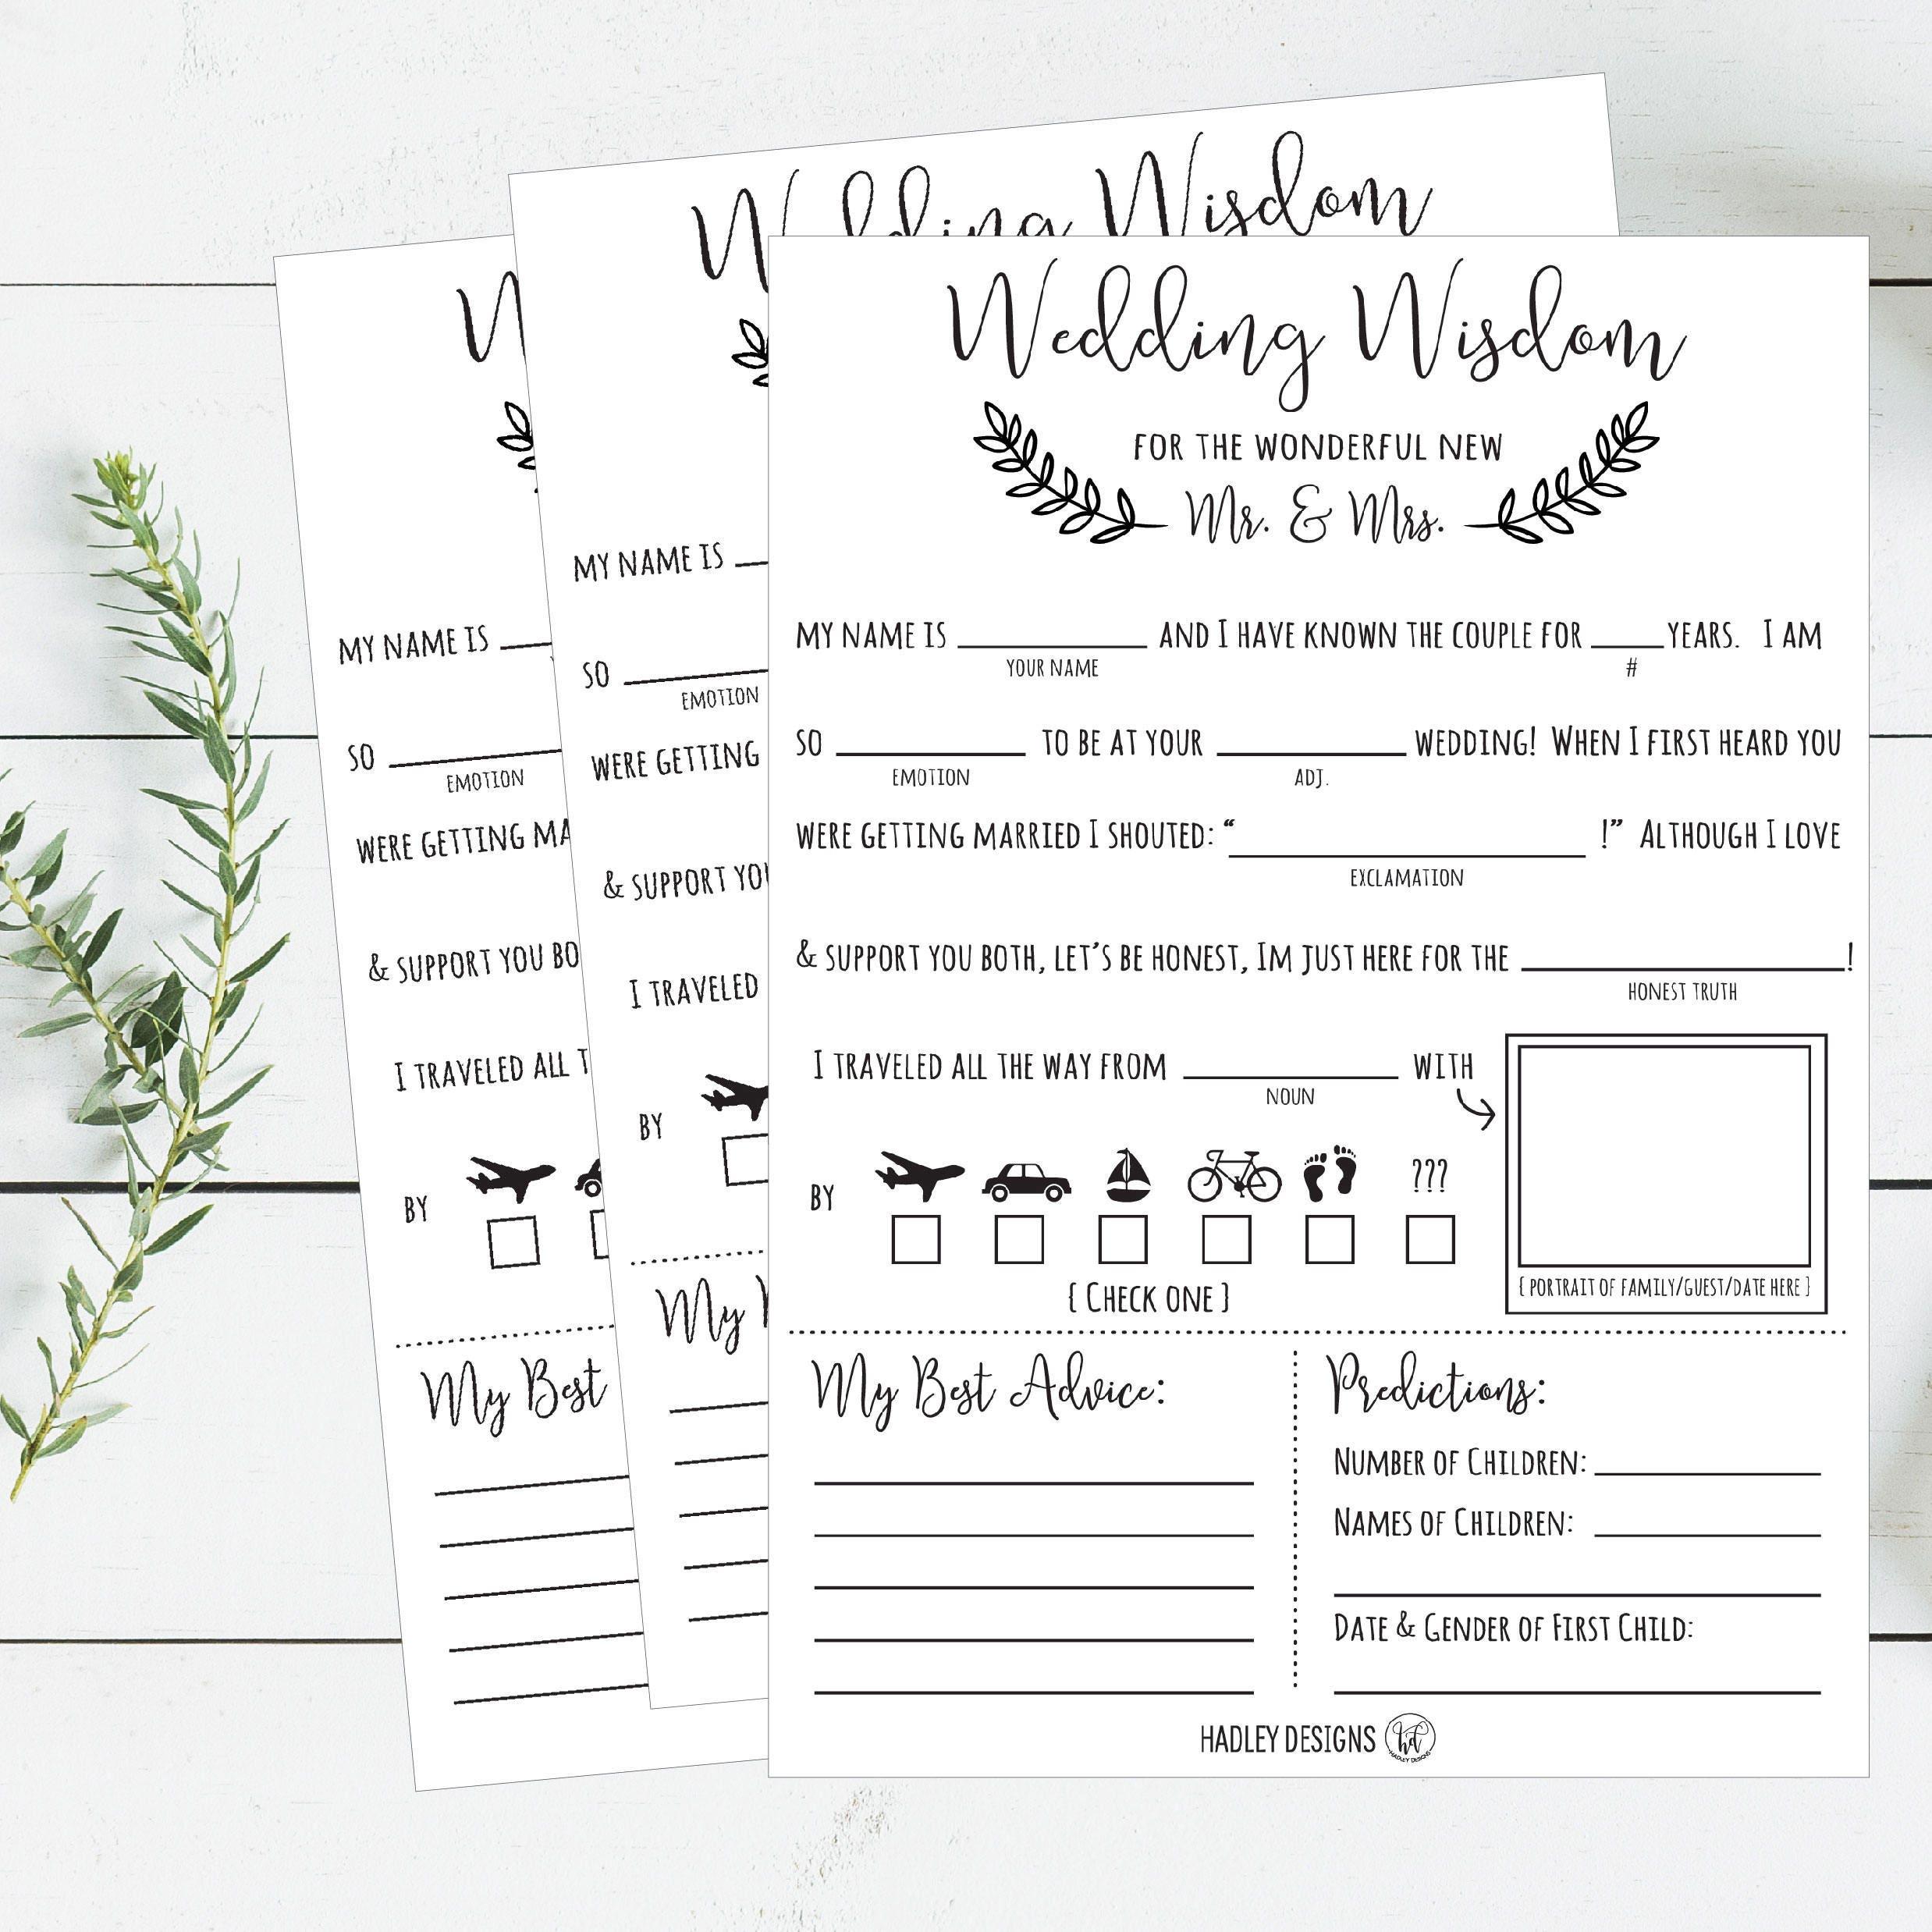 Mad Libs Wedding Wisdom Printable Cards Rustic Elegant Bride Etsy